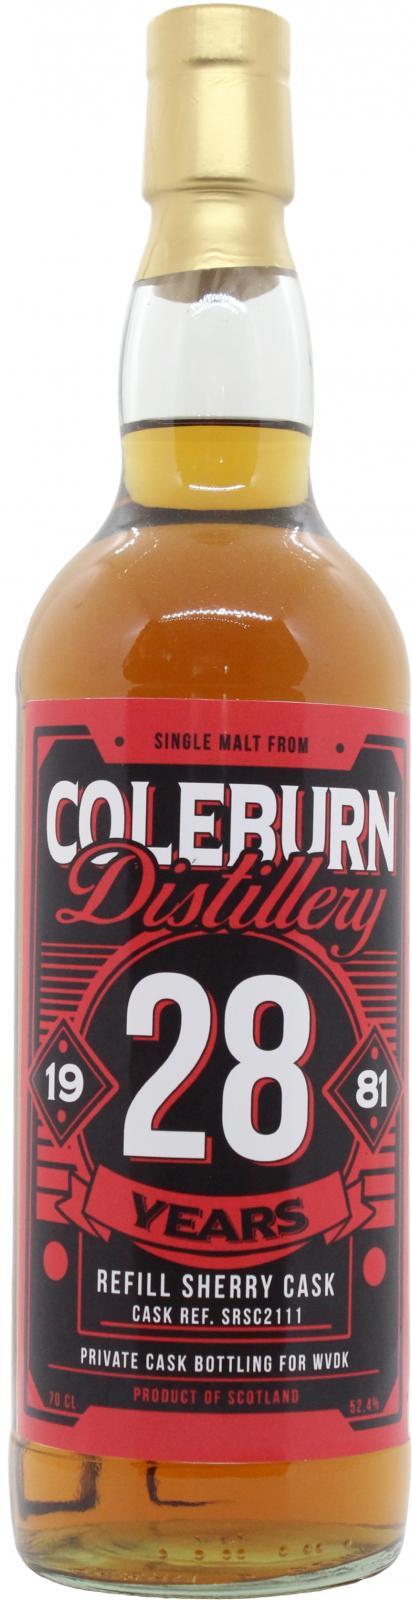 Coleburn 1981 UD